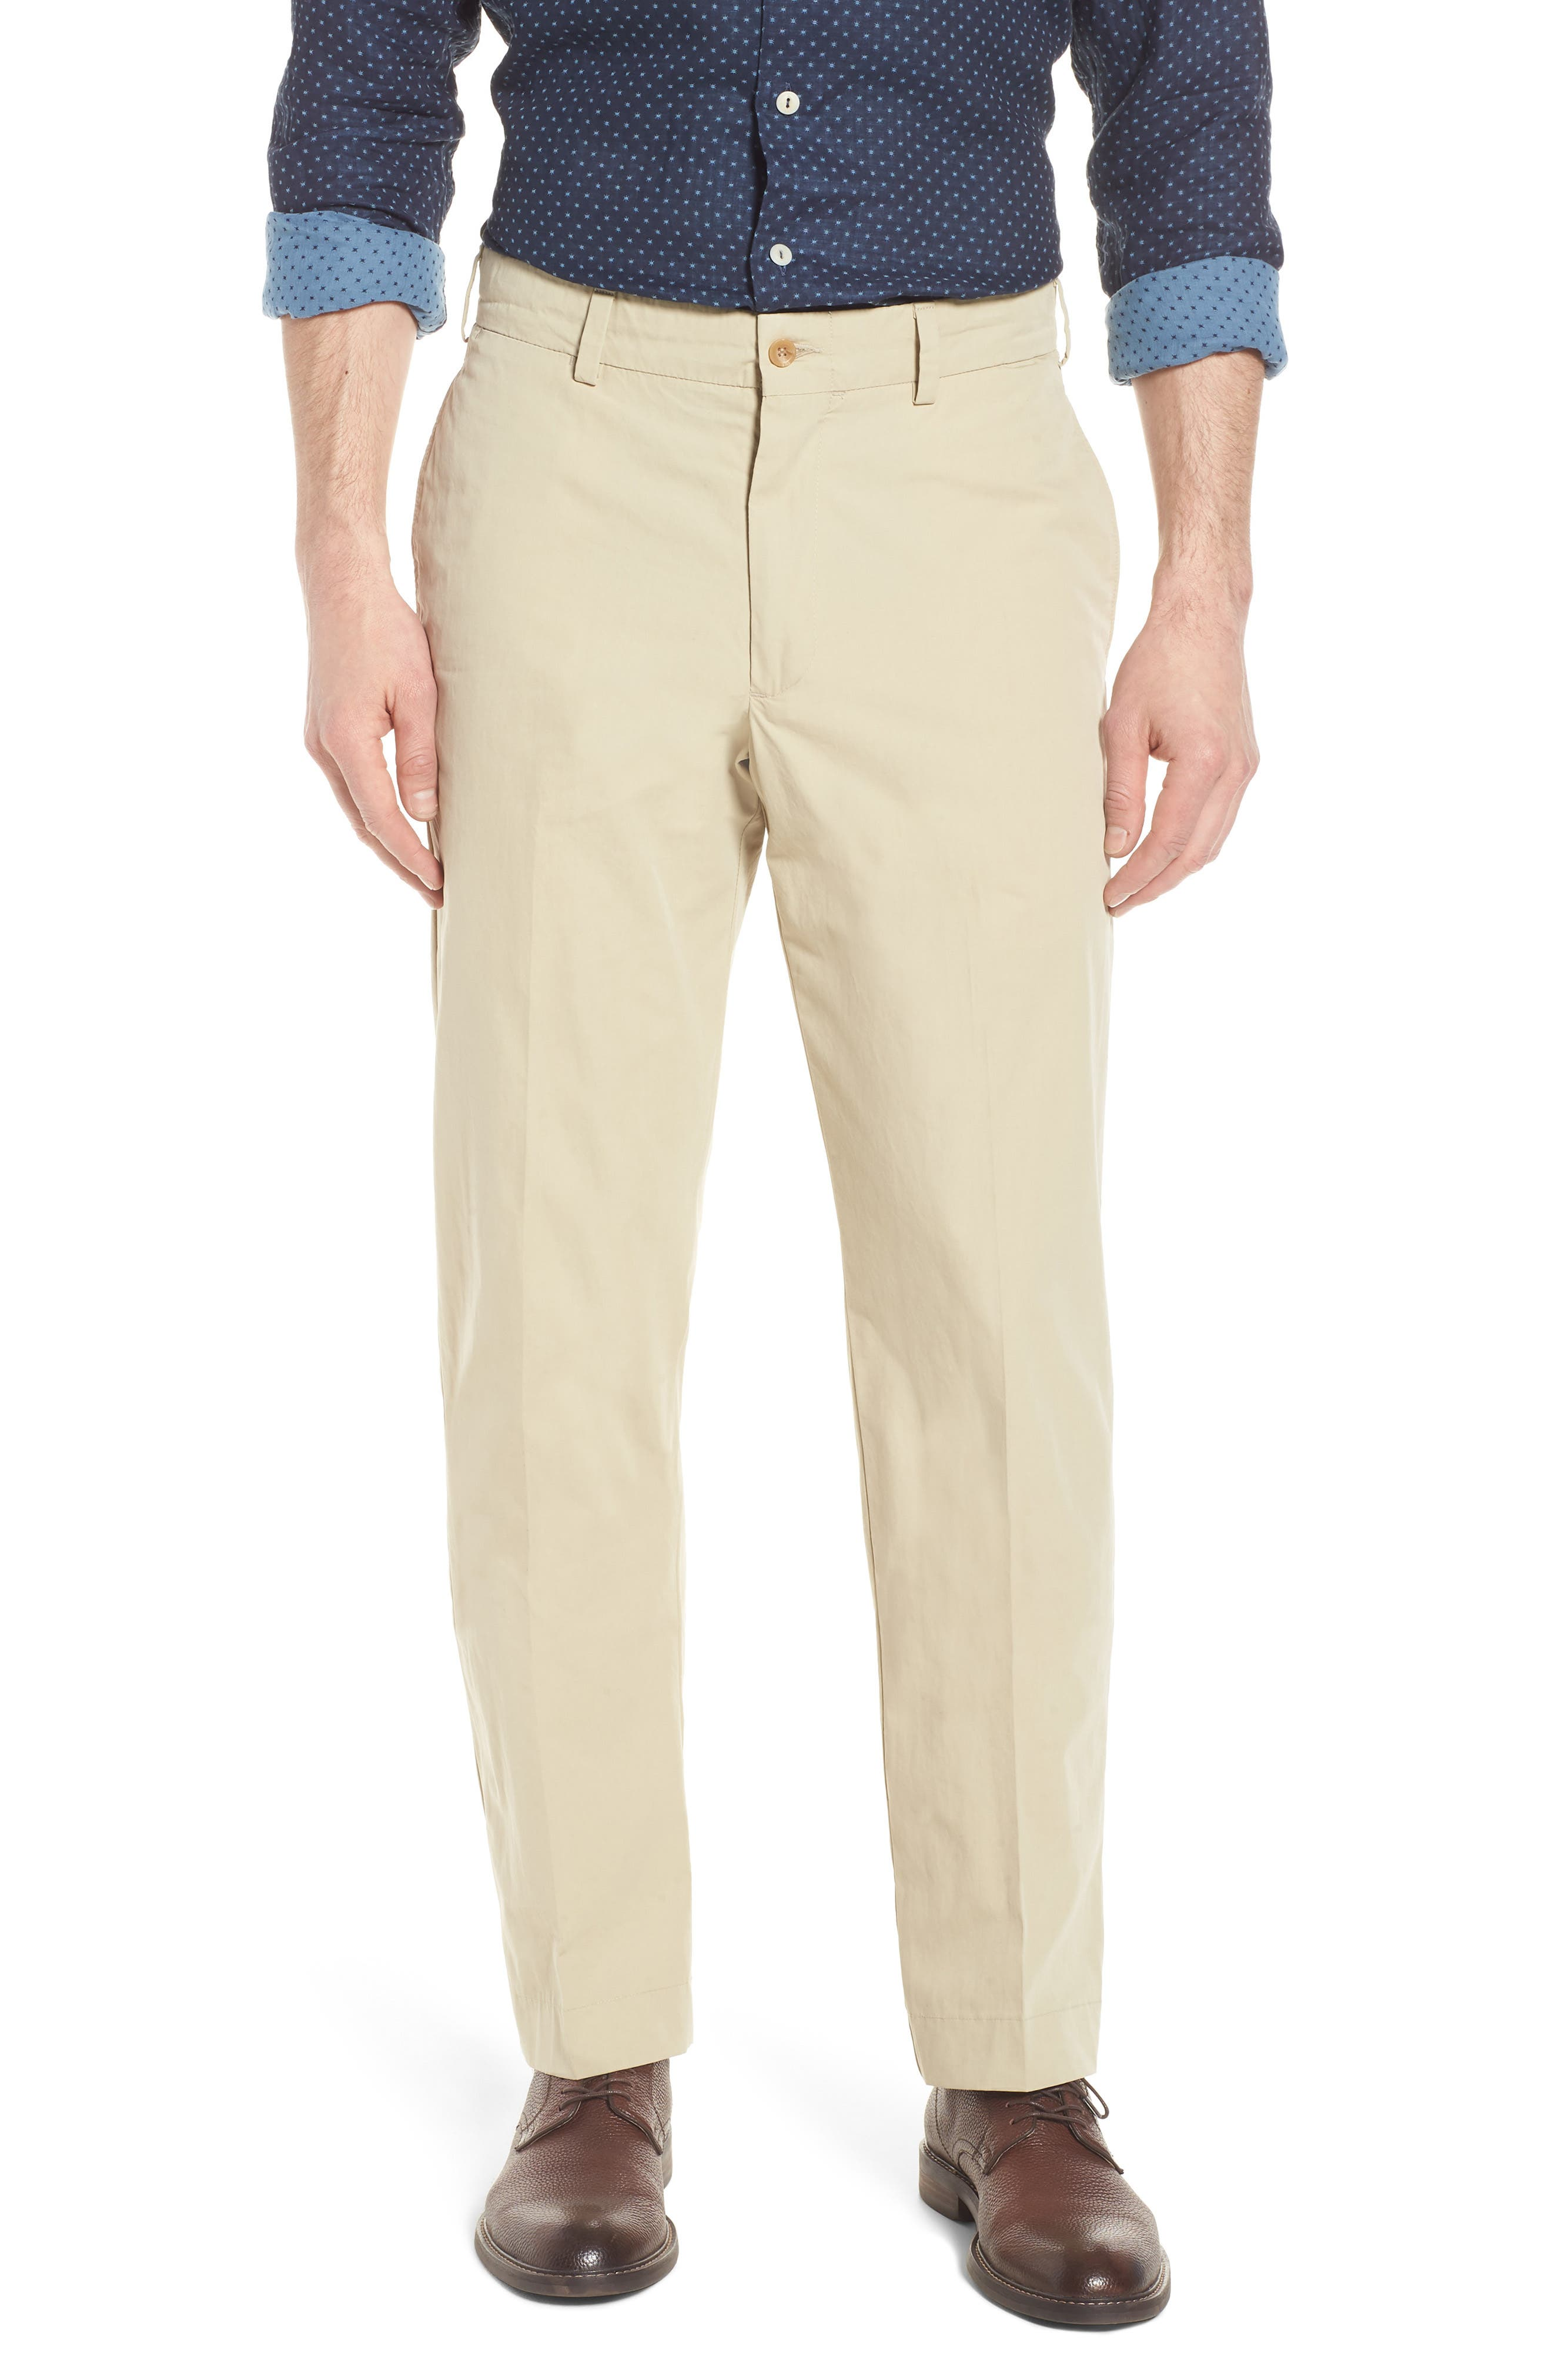 Bills Khakis M2 Classic Fit Flat Front Tropical Cotton Poplin Pants